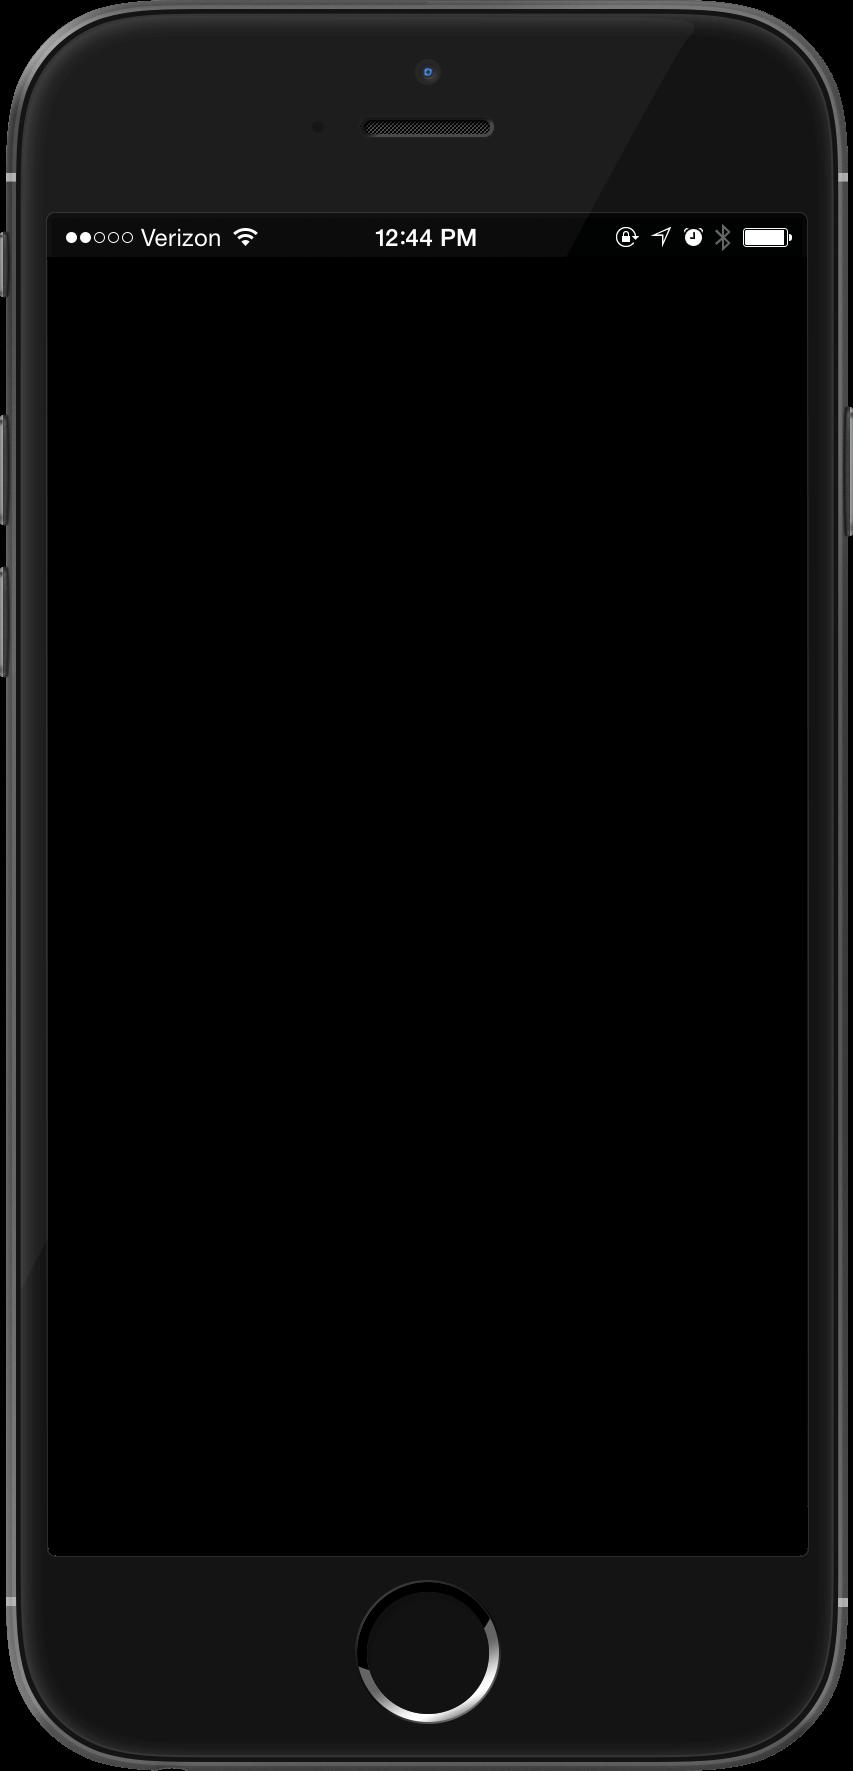 Best Wallpaper App For Iphone Mobile App Deviantart